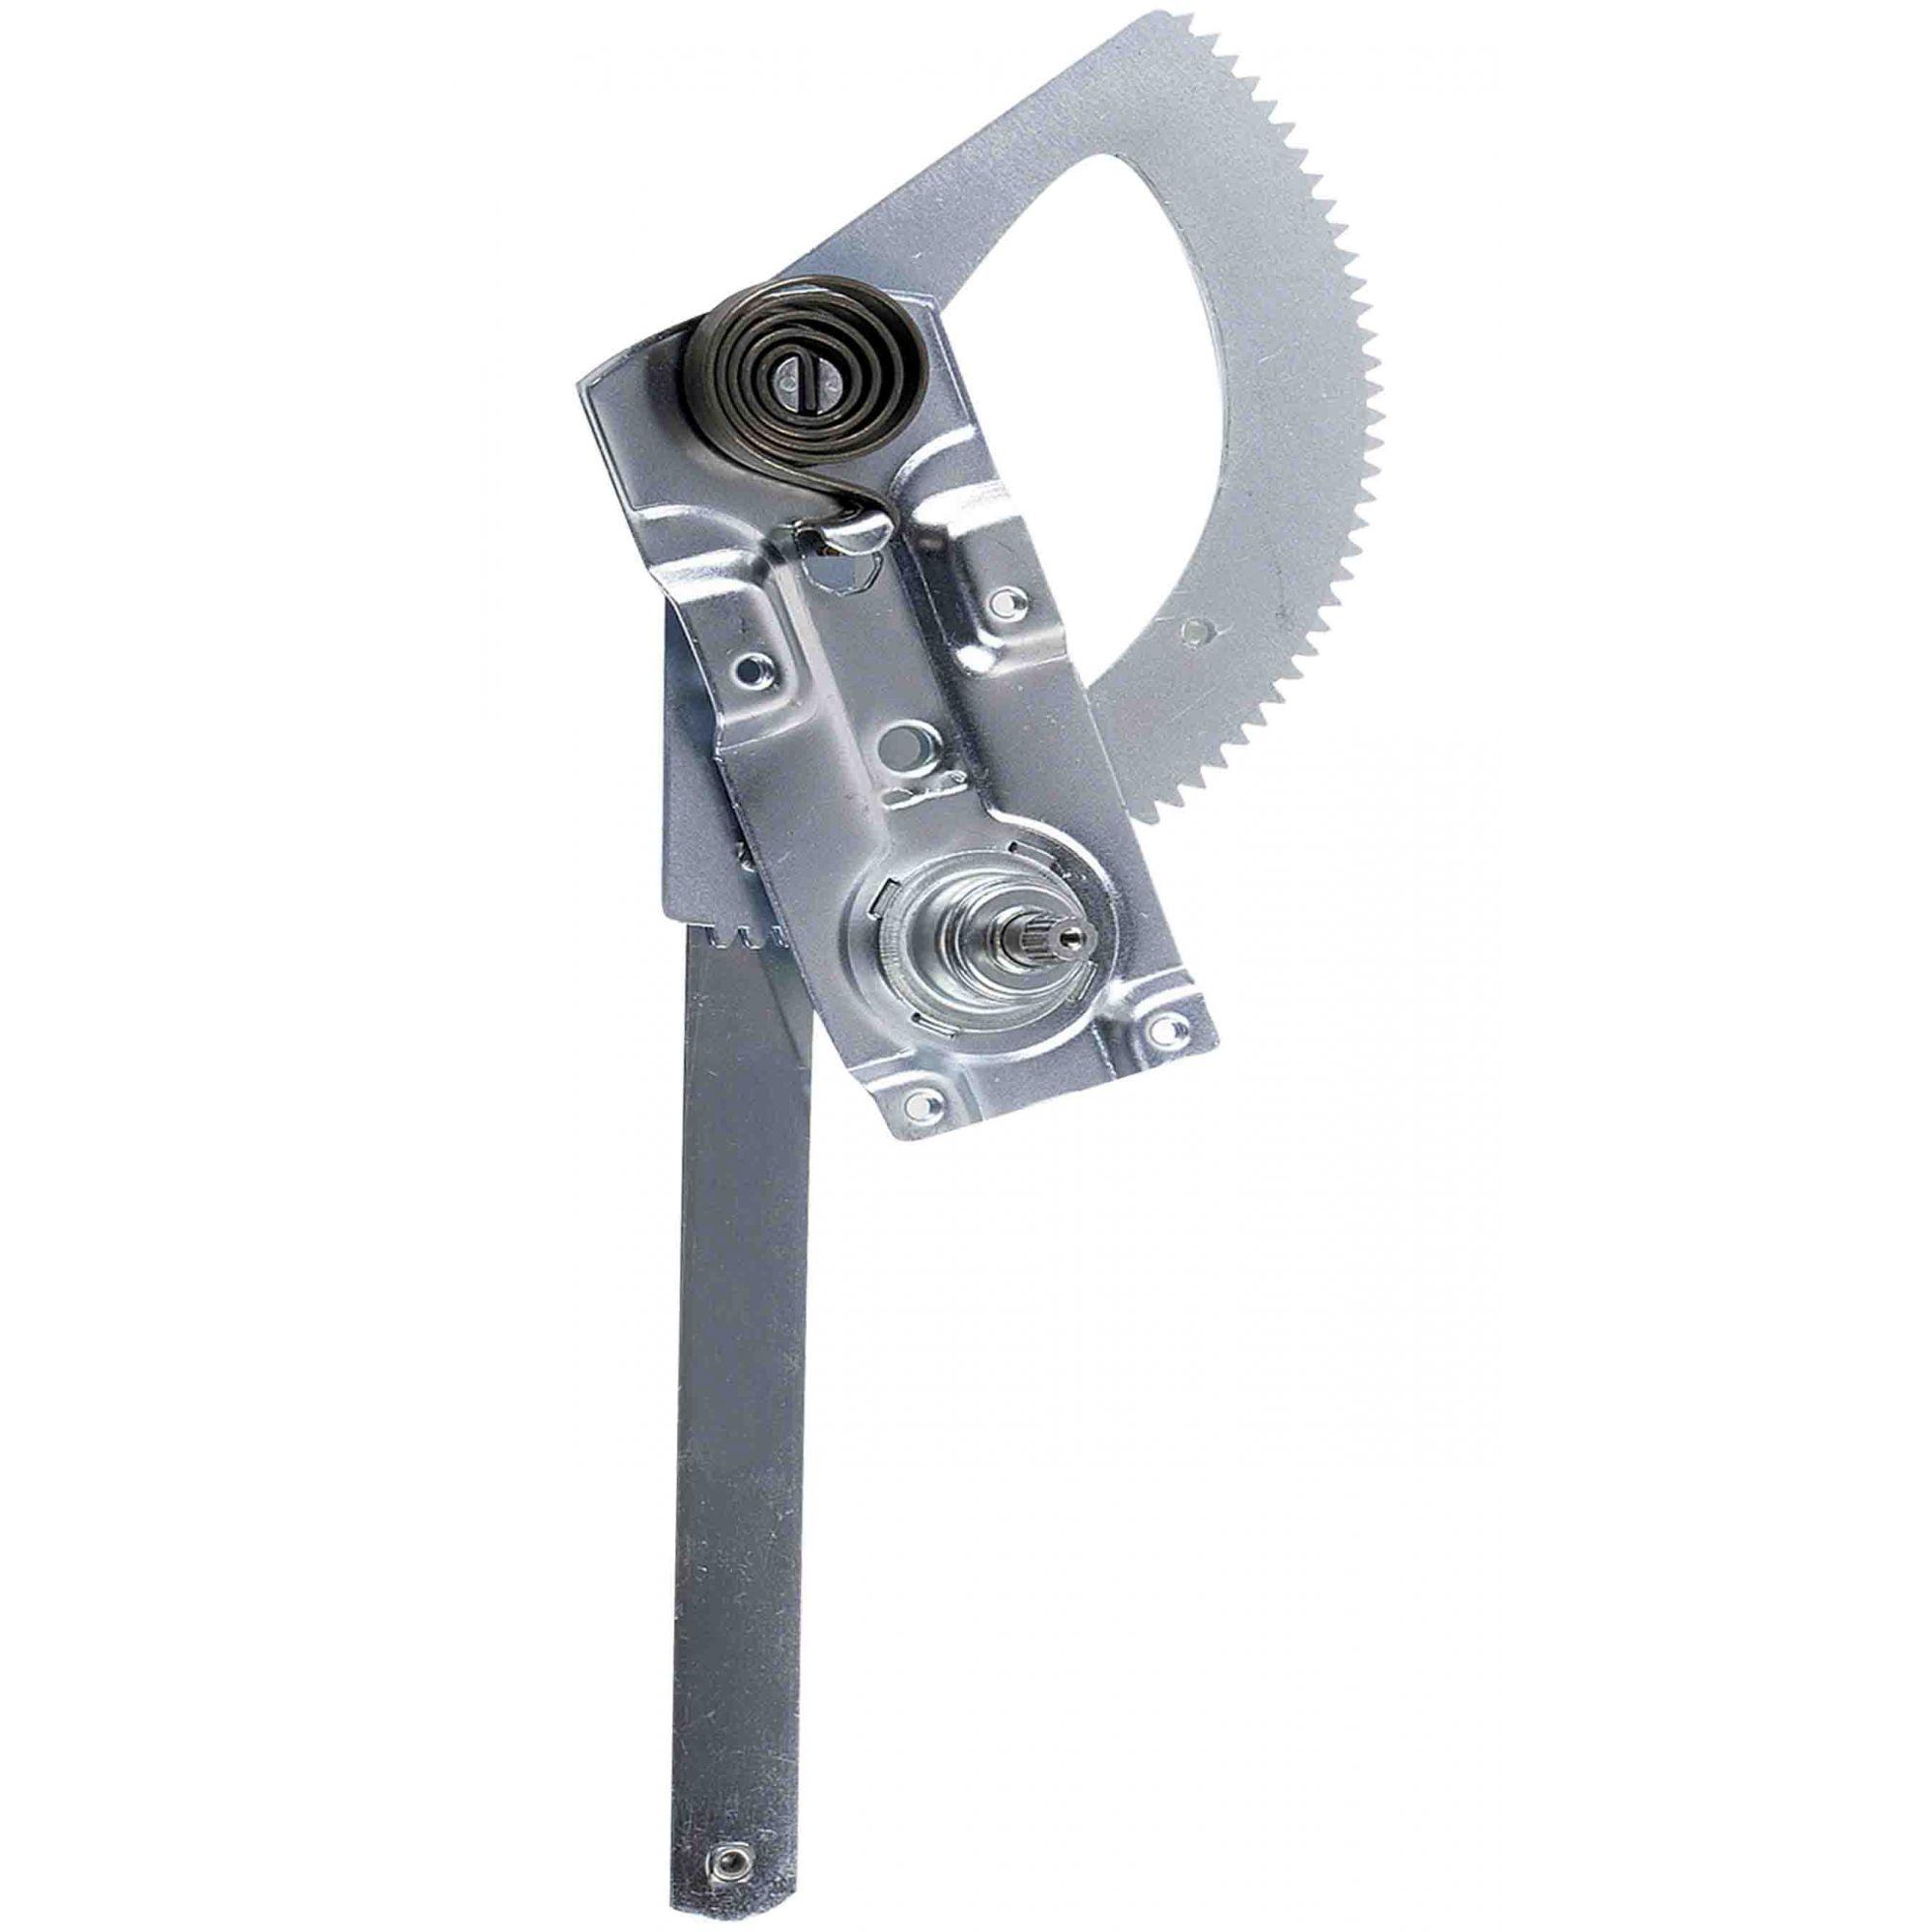 Máquina de Vidro Manual MB 1111 / 1113 / 1313 / 1513 / 2013 / 2213 Pino Curto